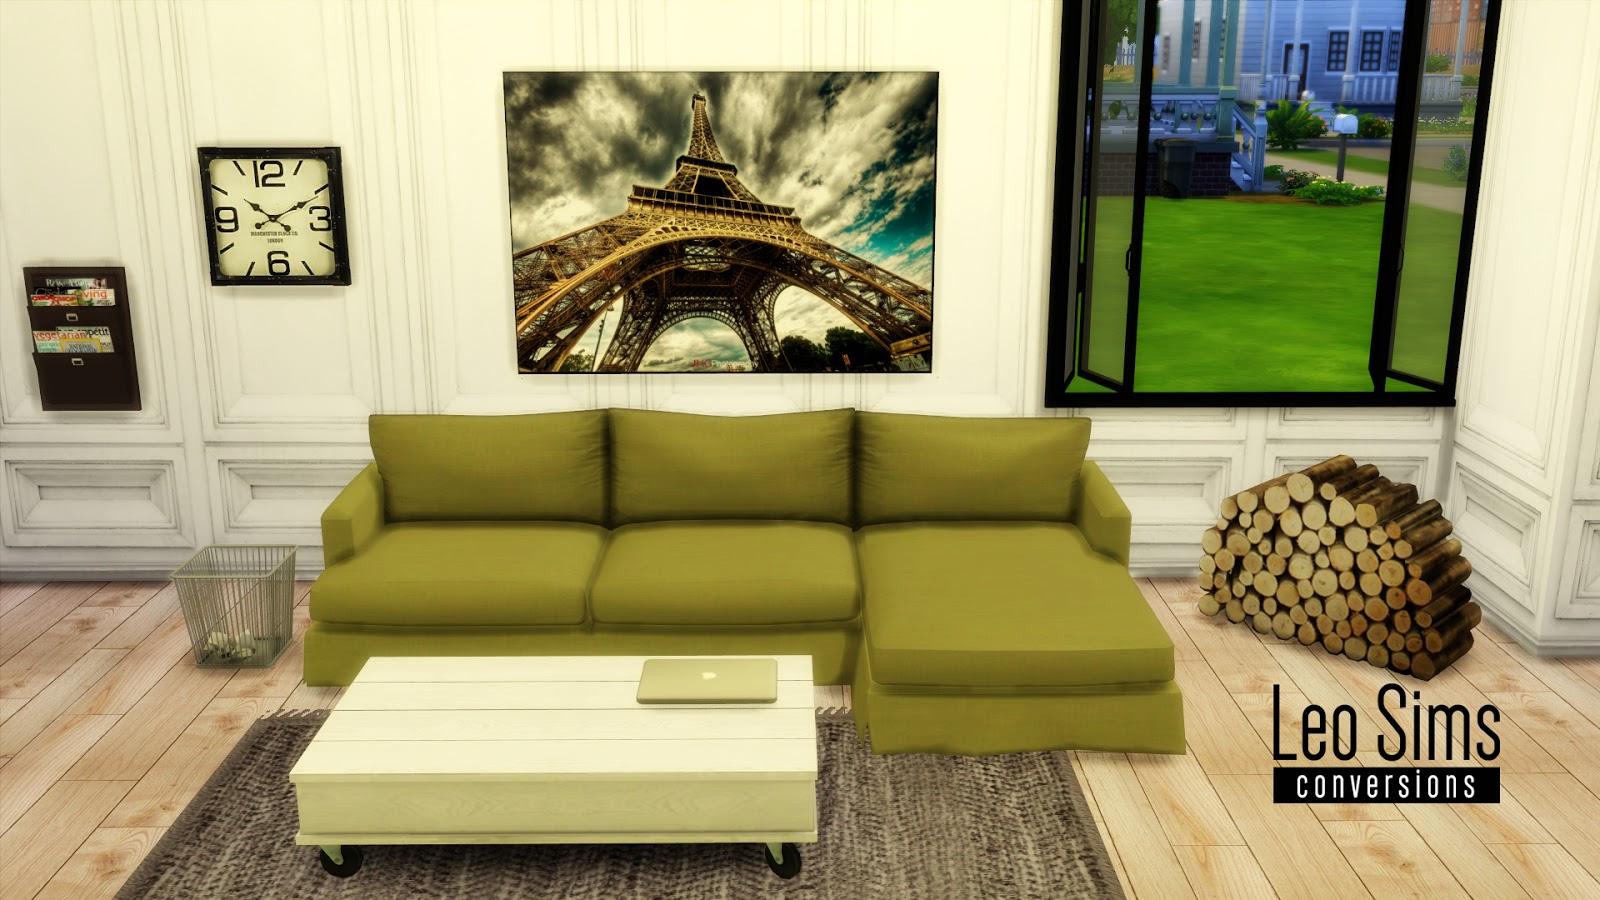 Ts2 Sofa Conversion By Leo4sims